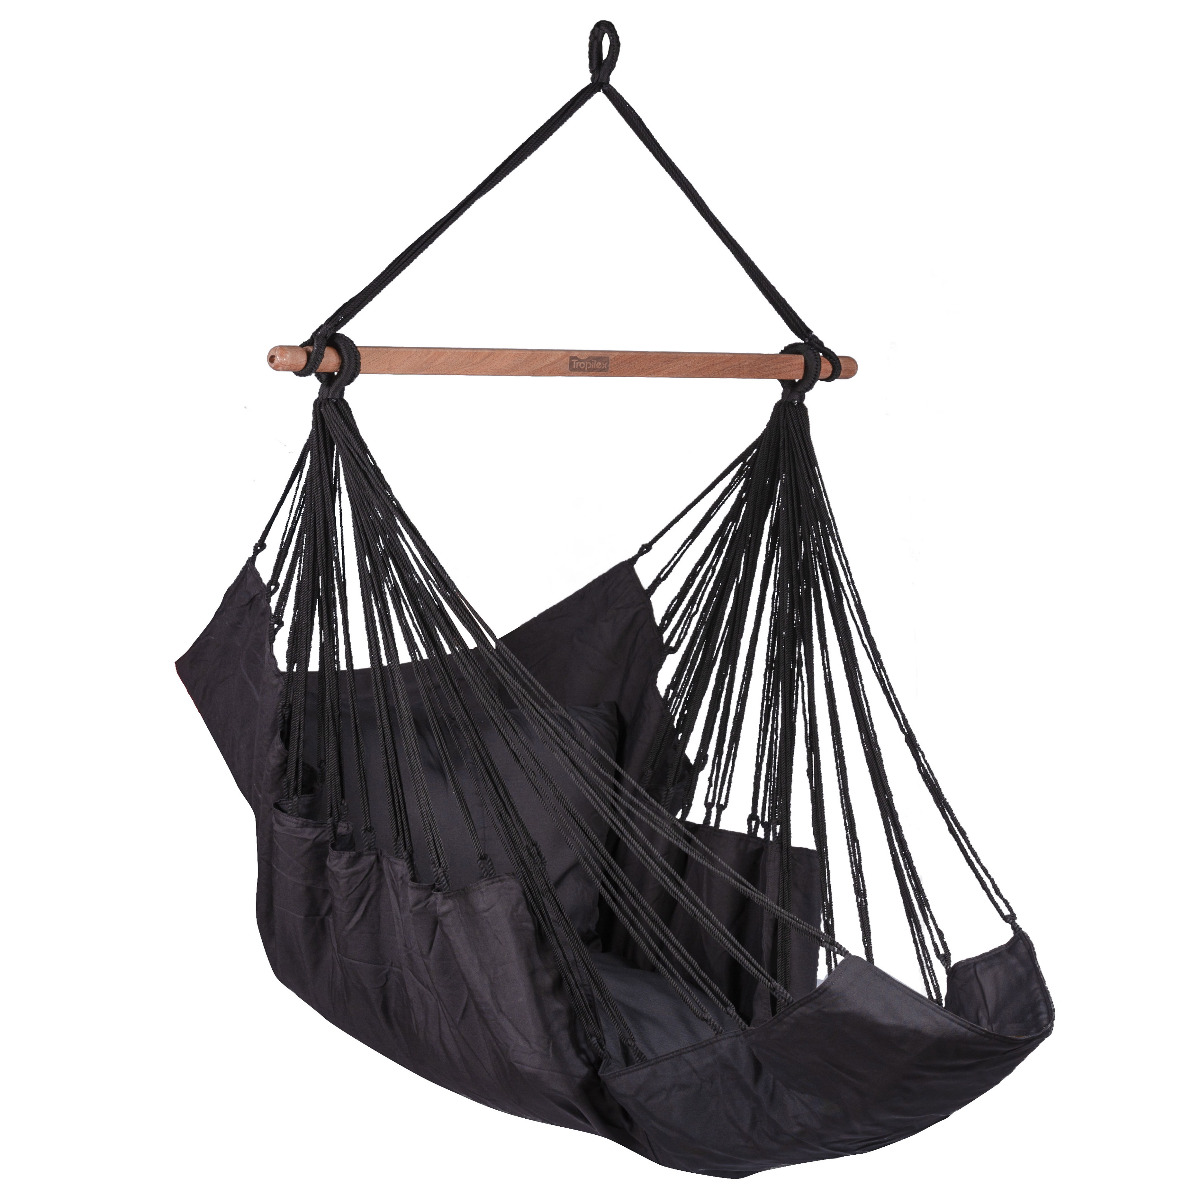 'Sereno' Black Hangstoel - Zwart - Tropilex �